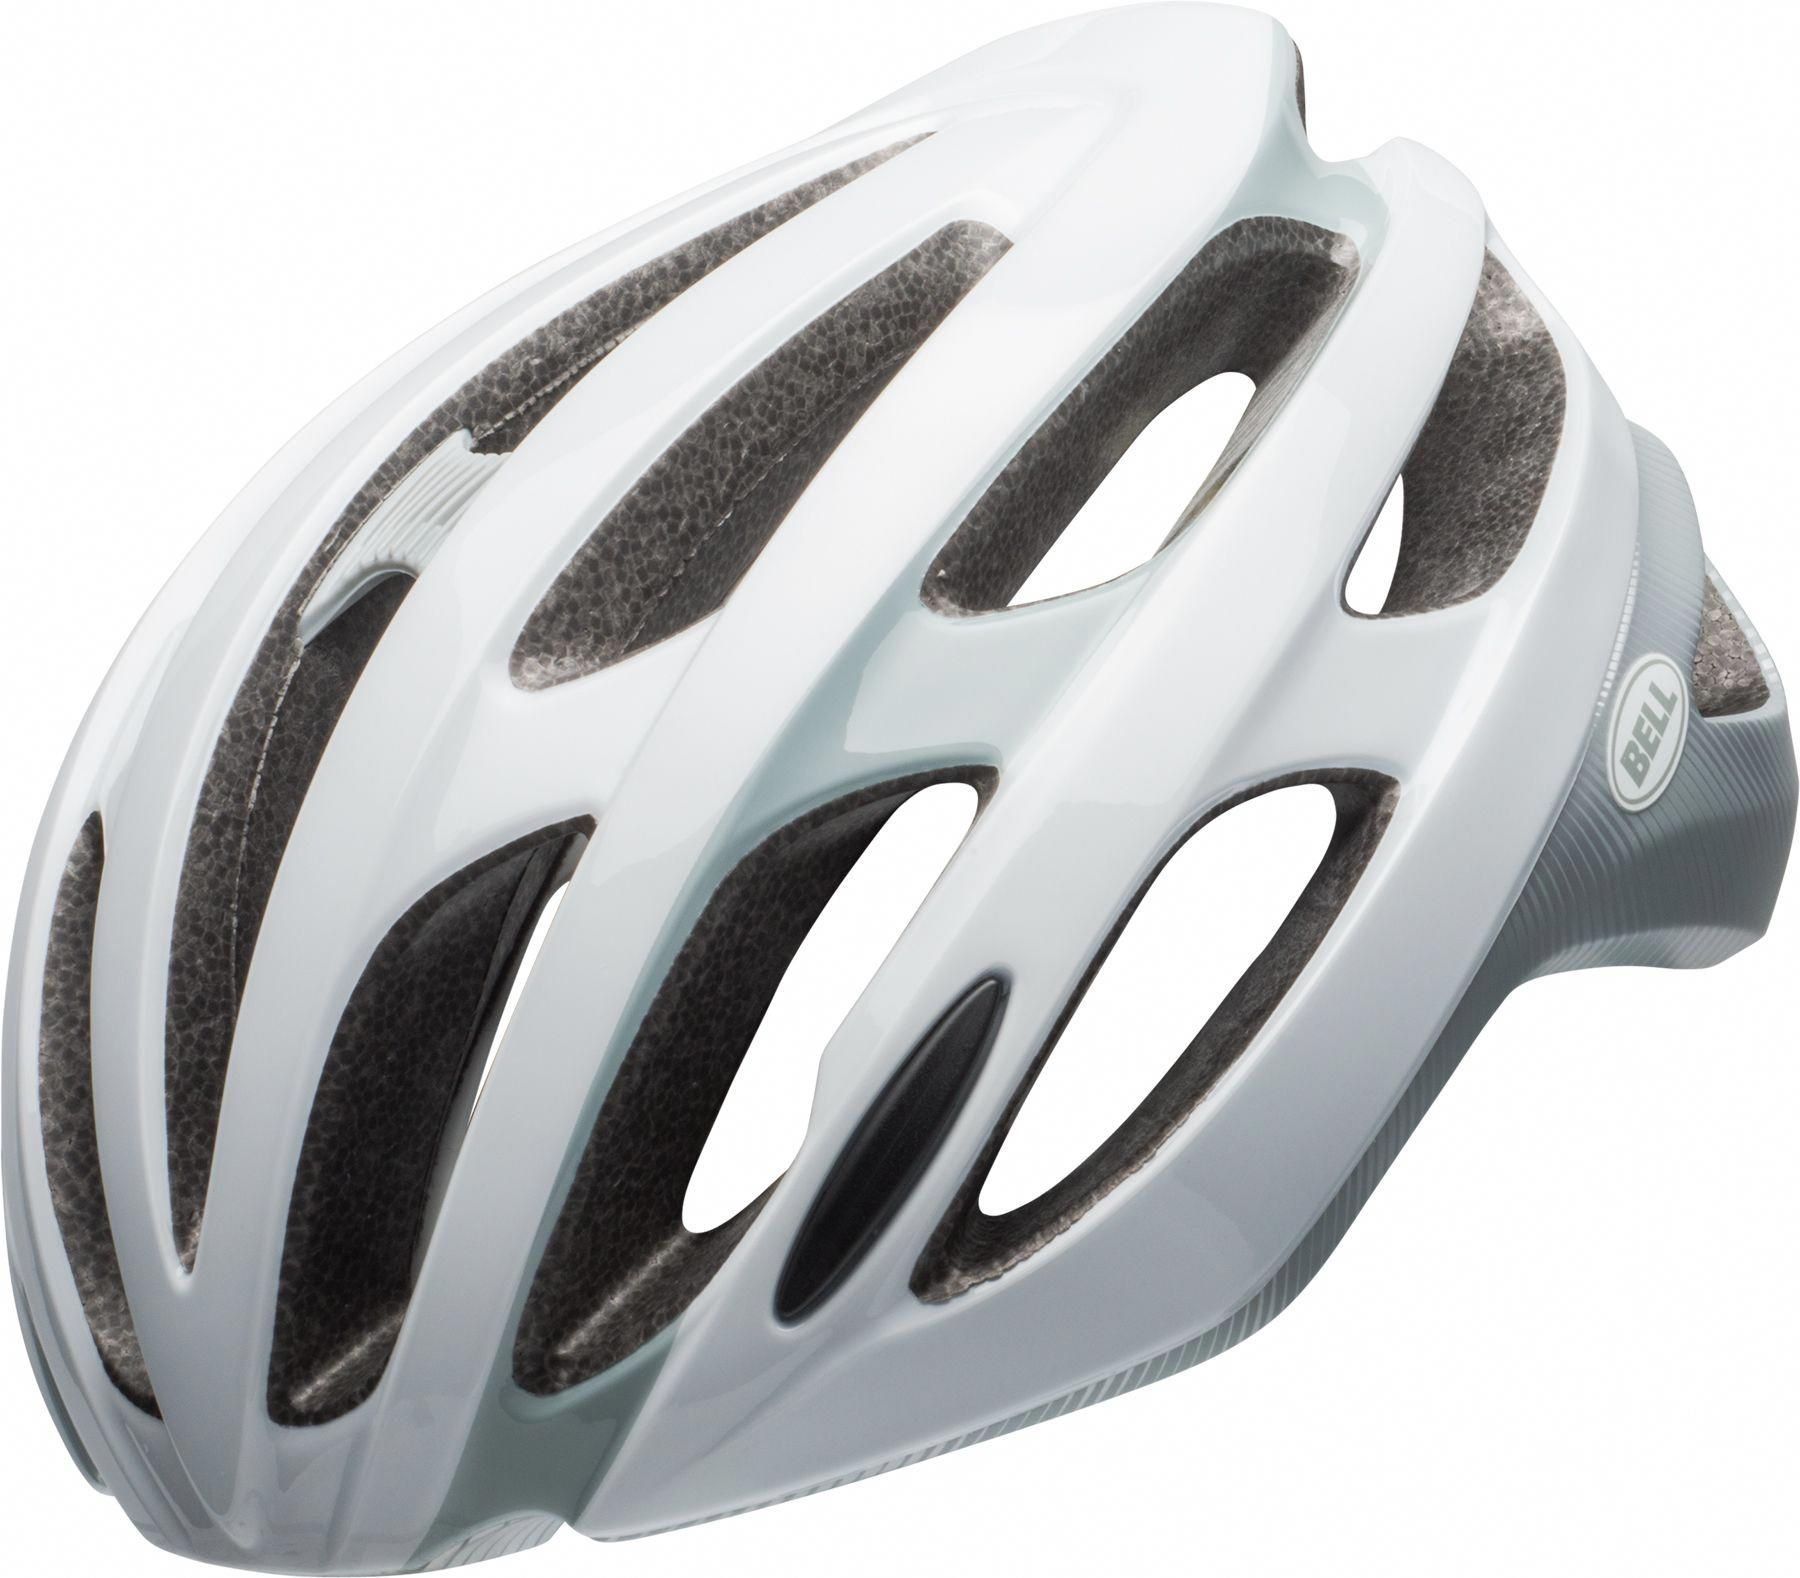 Bell Adult Falcon Mips Bike Helmet Matte Gloss White Grey